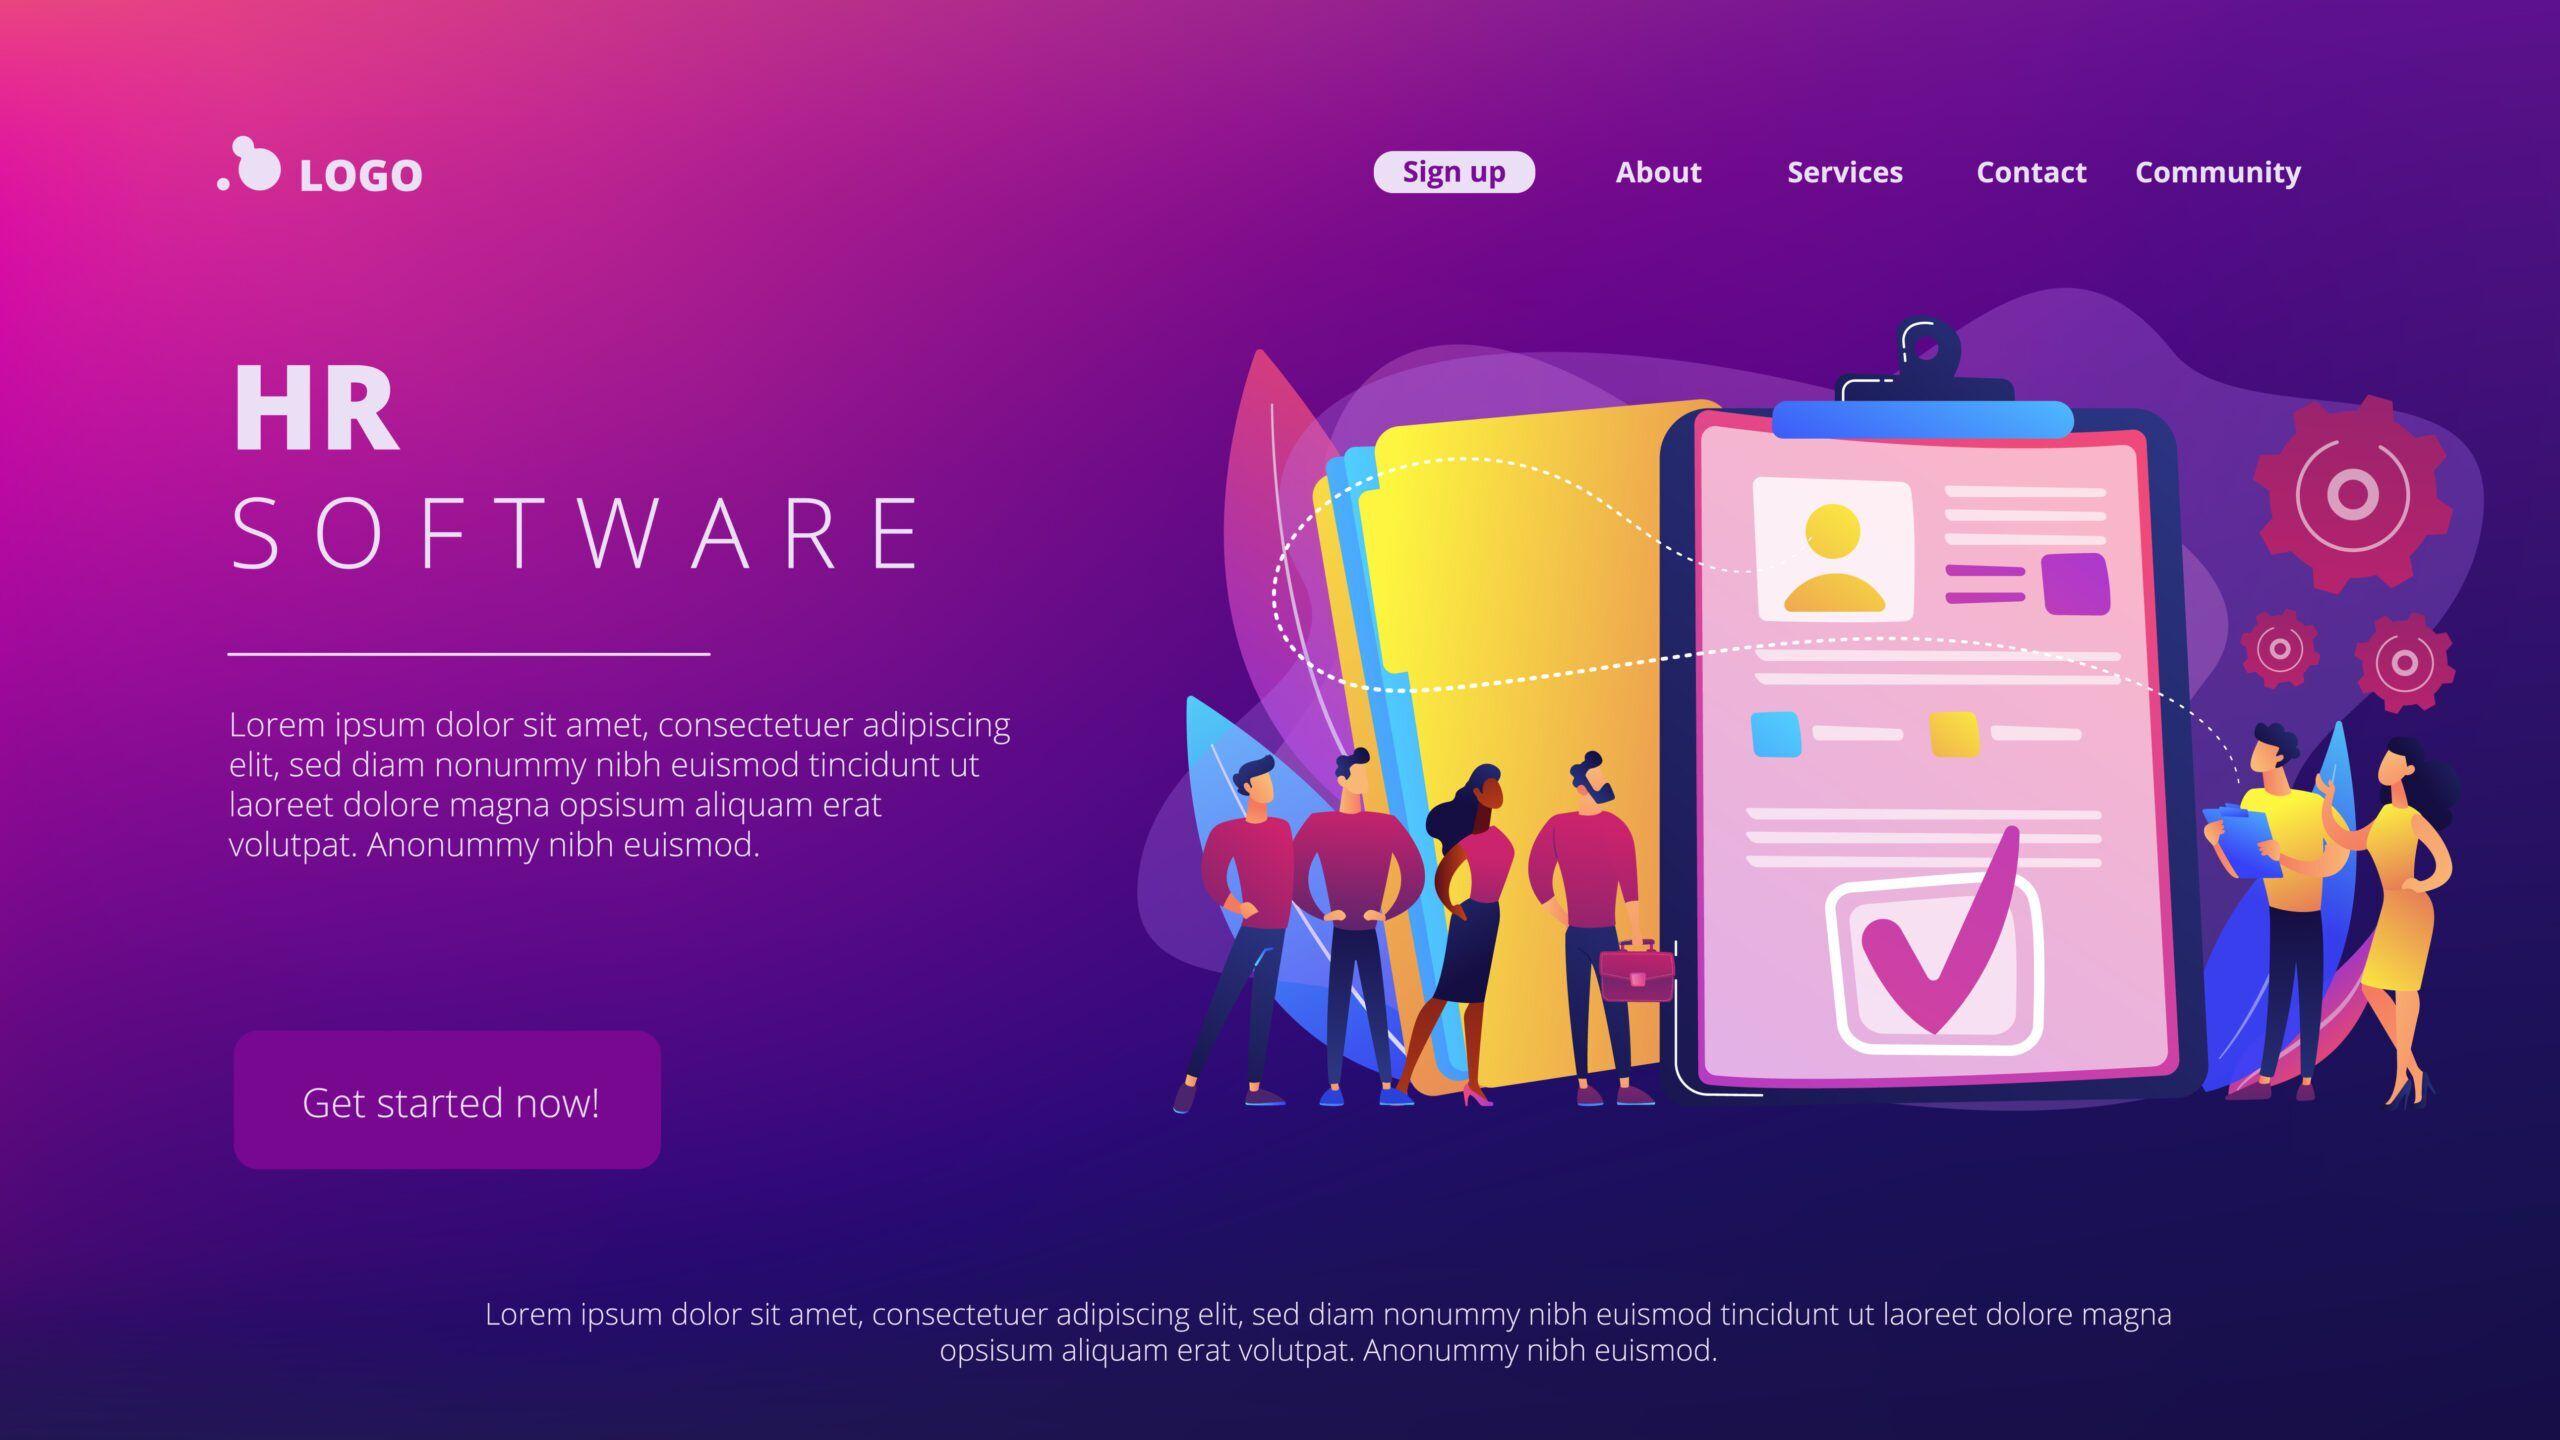 HR Software WordPress Bewerberportal